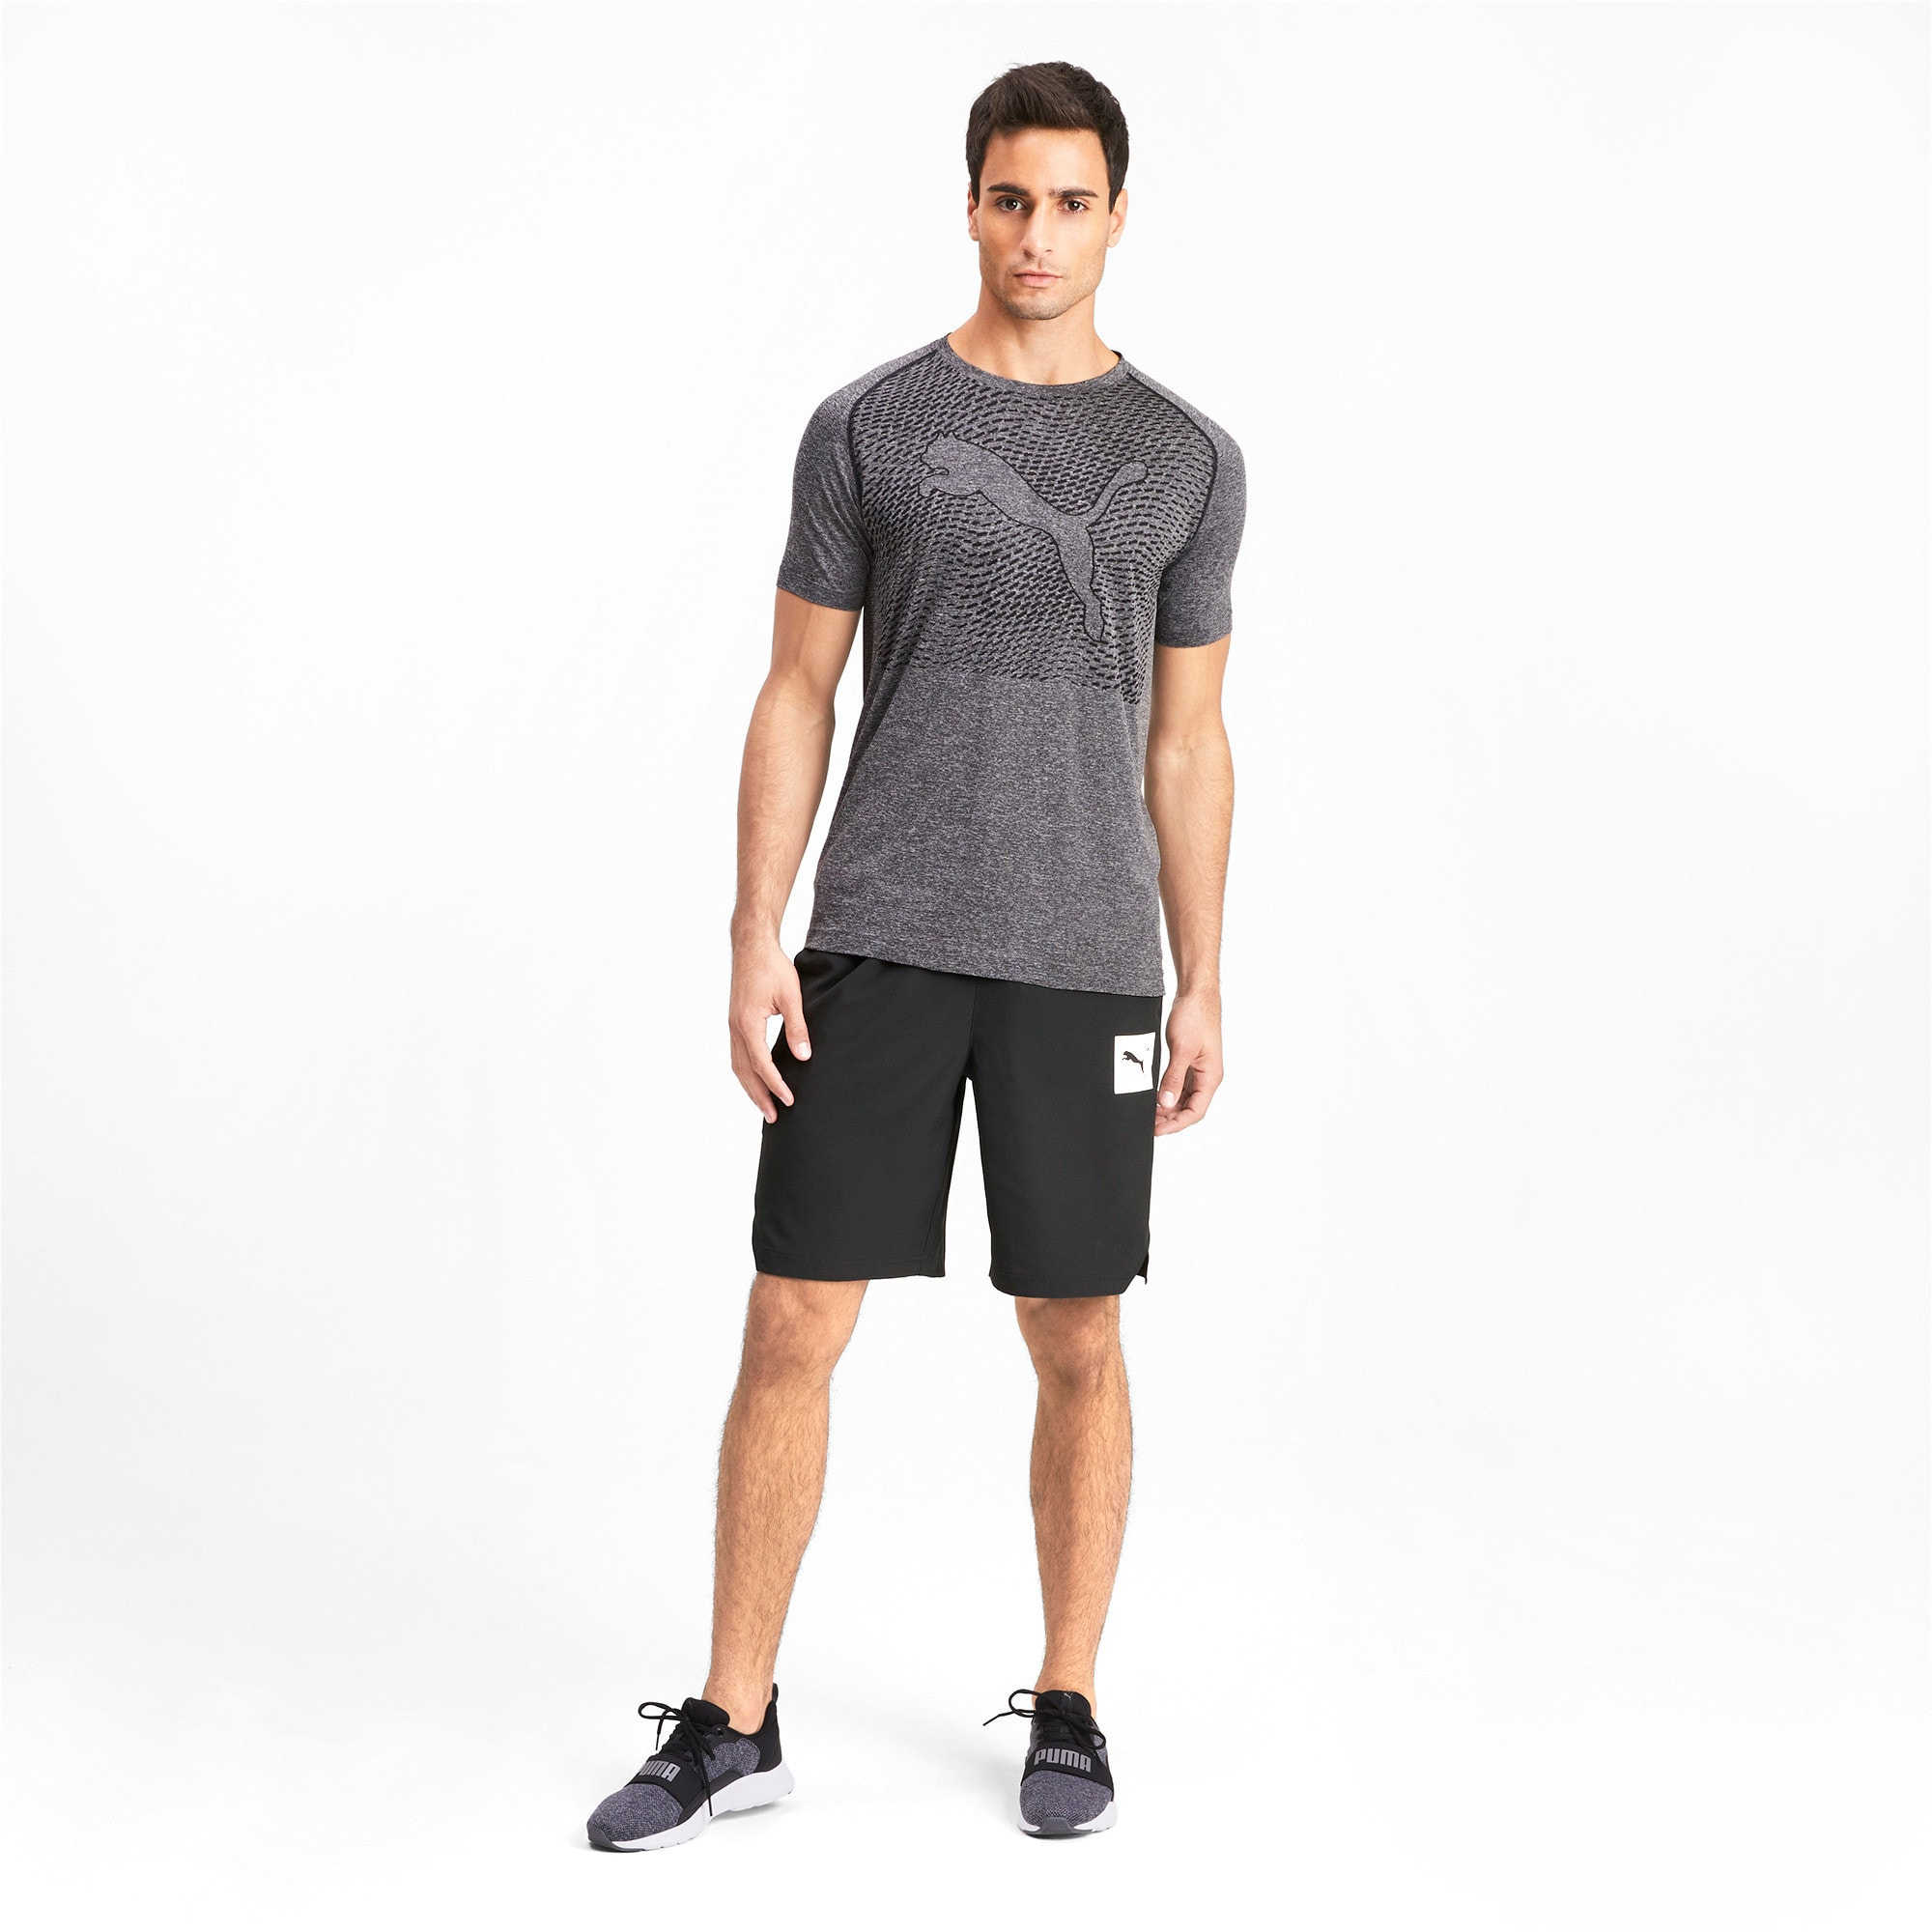 Thumbnail 3 of Tec Sports Men's Woven Shorts, Puma Black, medium-IND